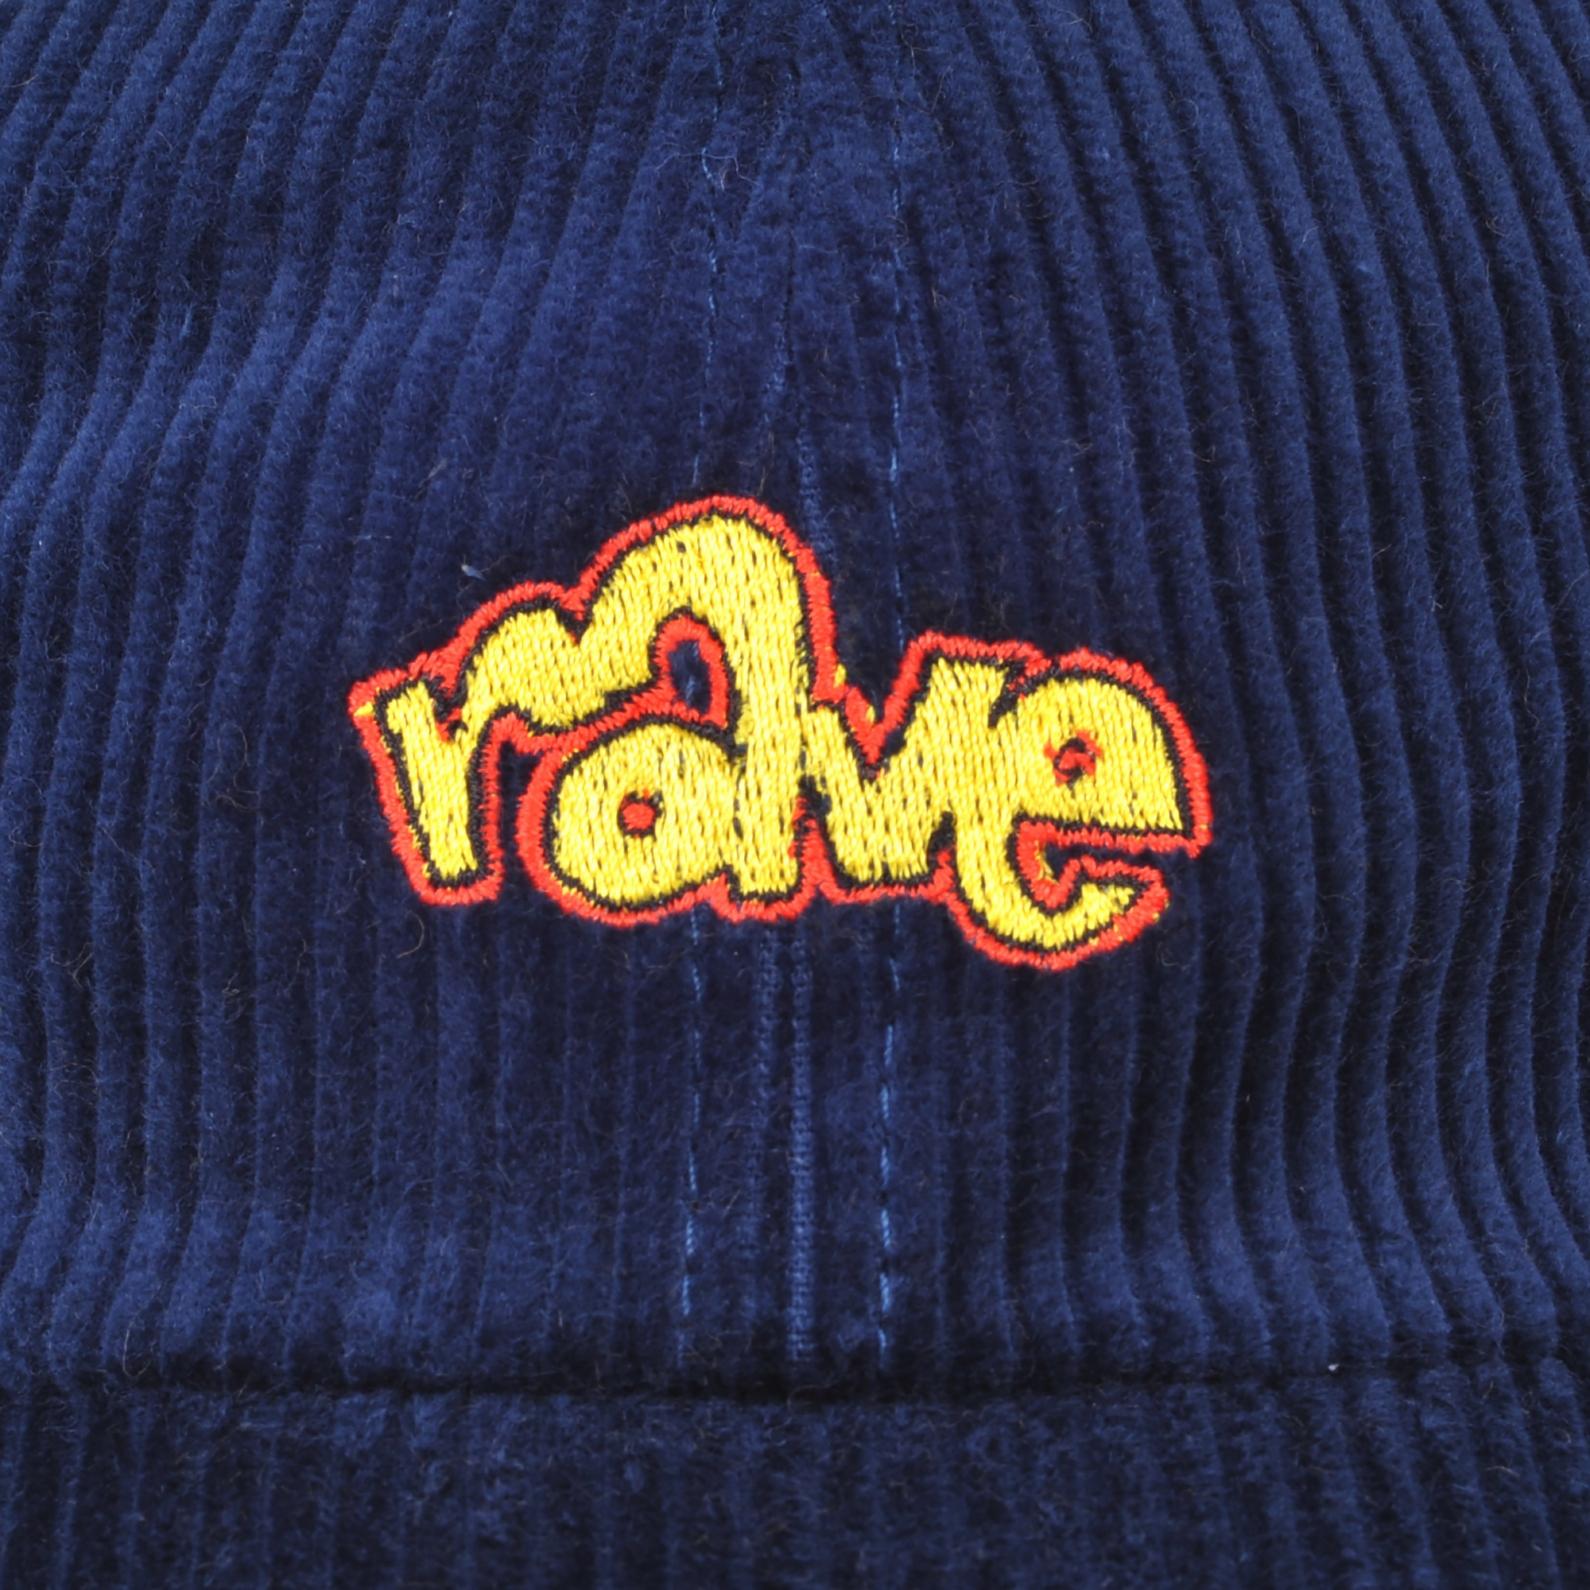 【RAVE SKATEBOARDS/レイブスケートボード】SPIKE CORDUROY CAP コーデュロイダドキャップ / NAVY